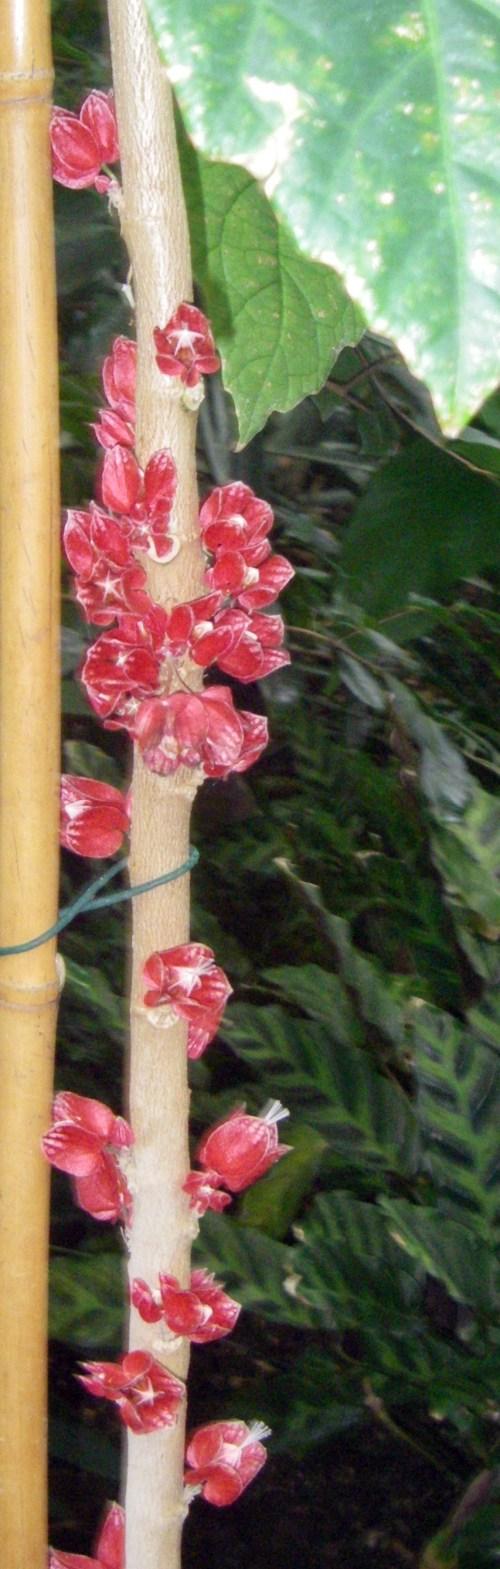 Goethea strictiflora 6726539257_1affeb35eb_o